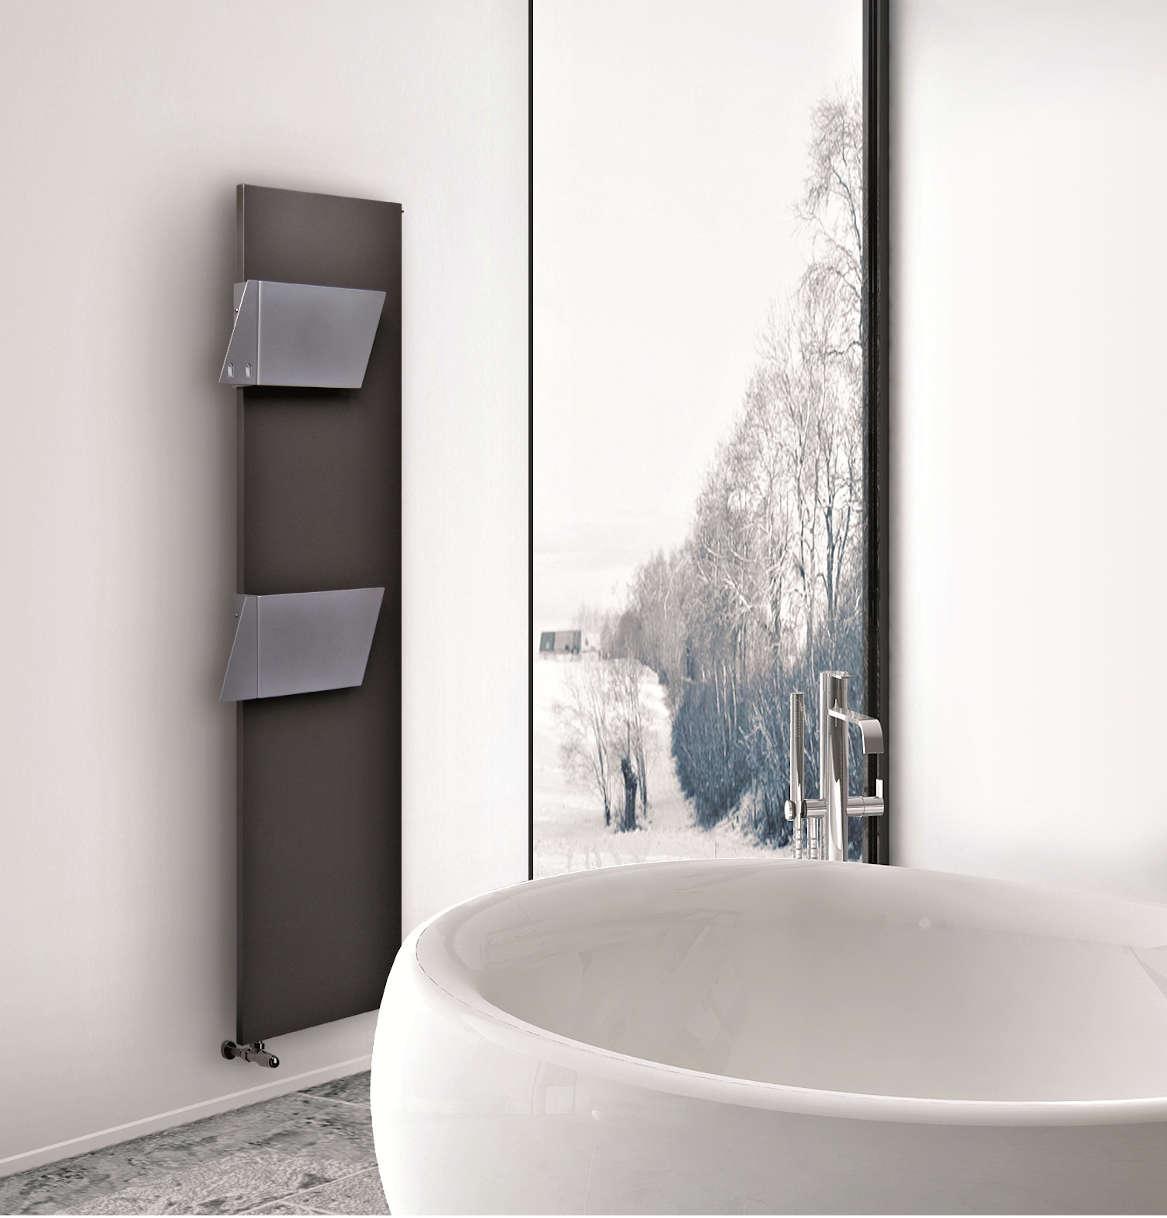 plate heated towel rail white colored brem romè 2019